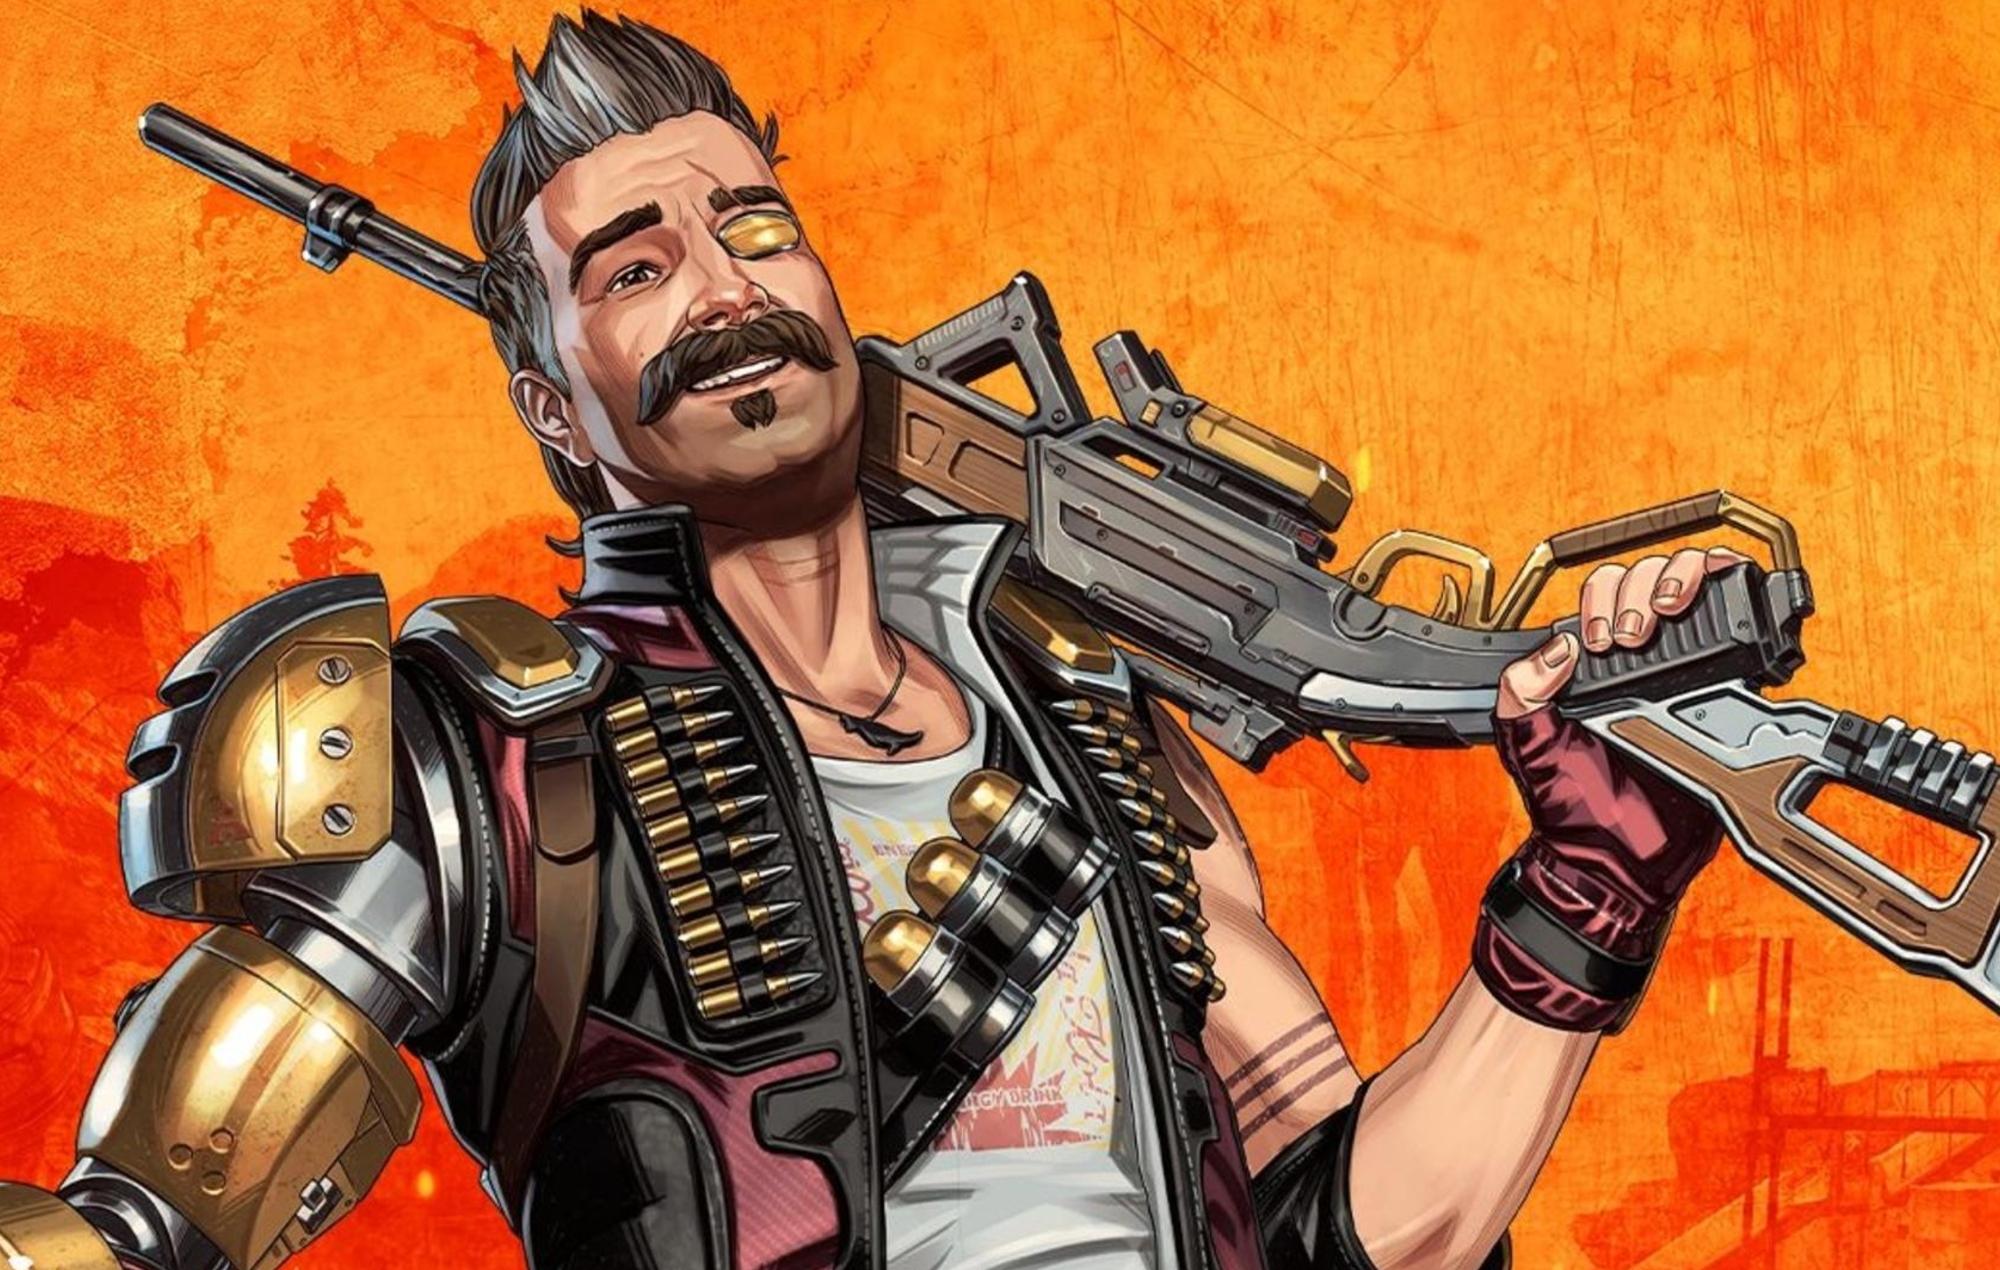 Apex Legends' Season 8 introduces new hero Fuse, a demolitions expert